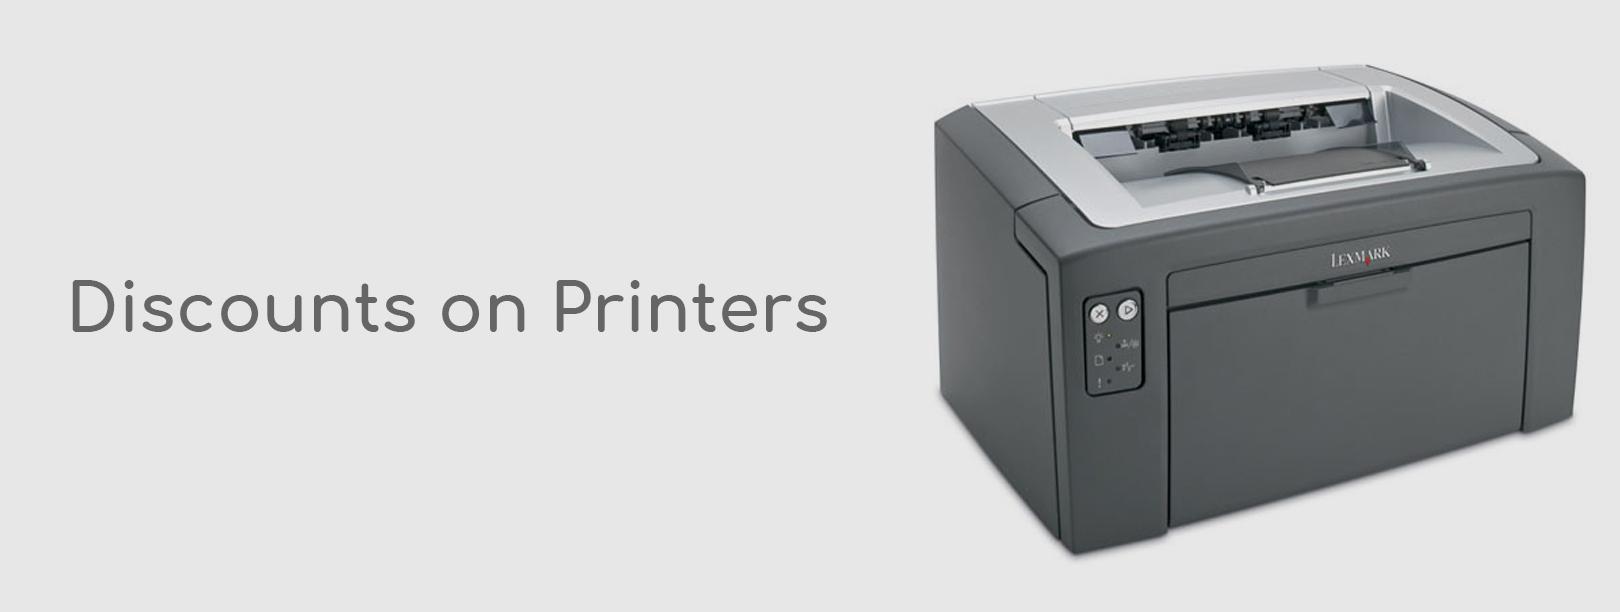 Flipkart Printers